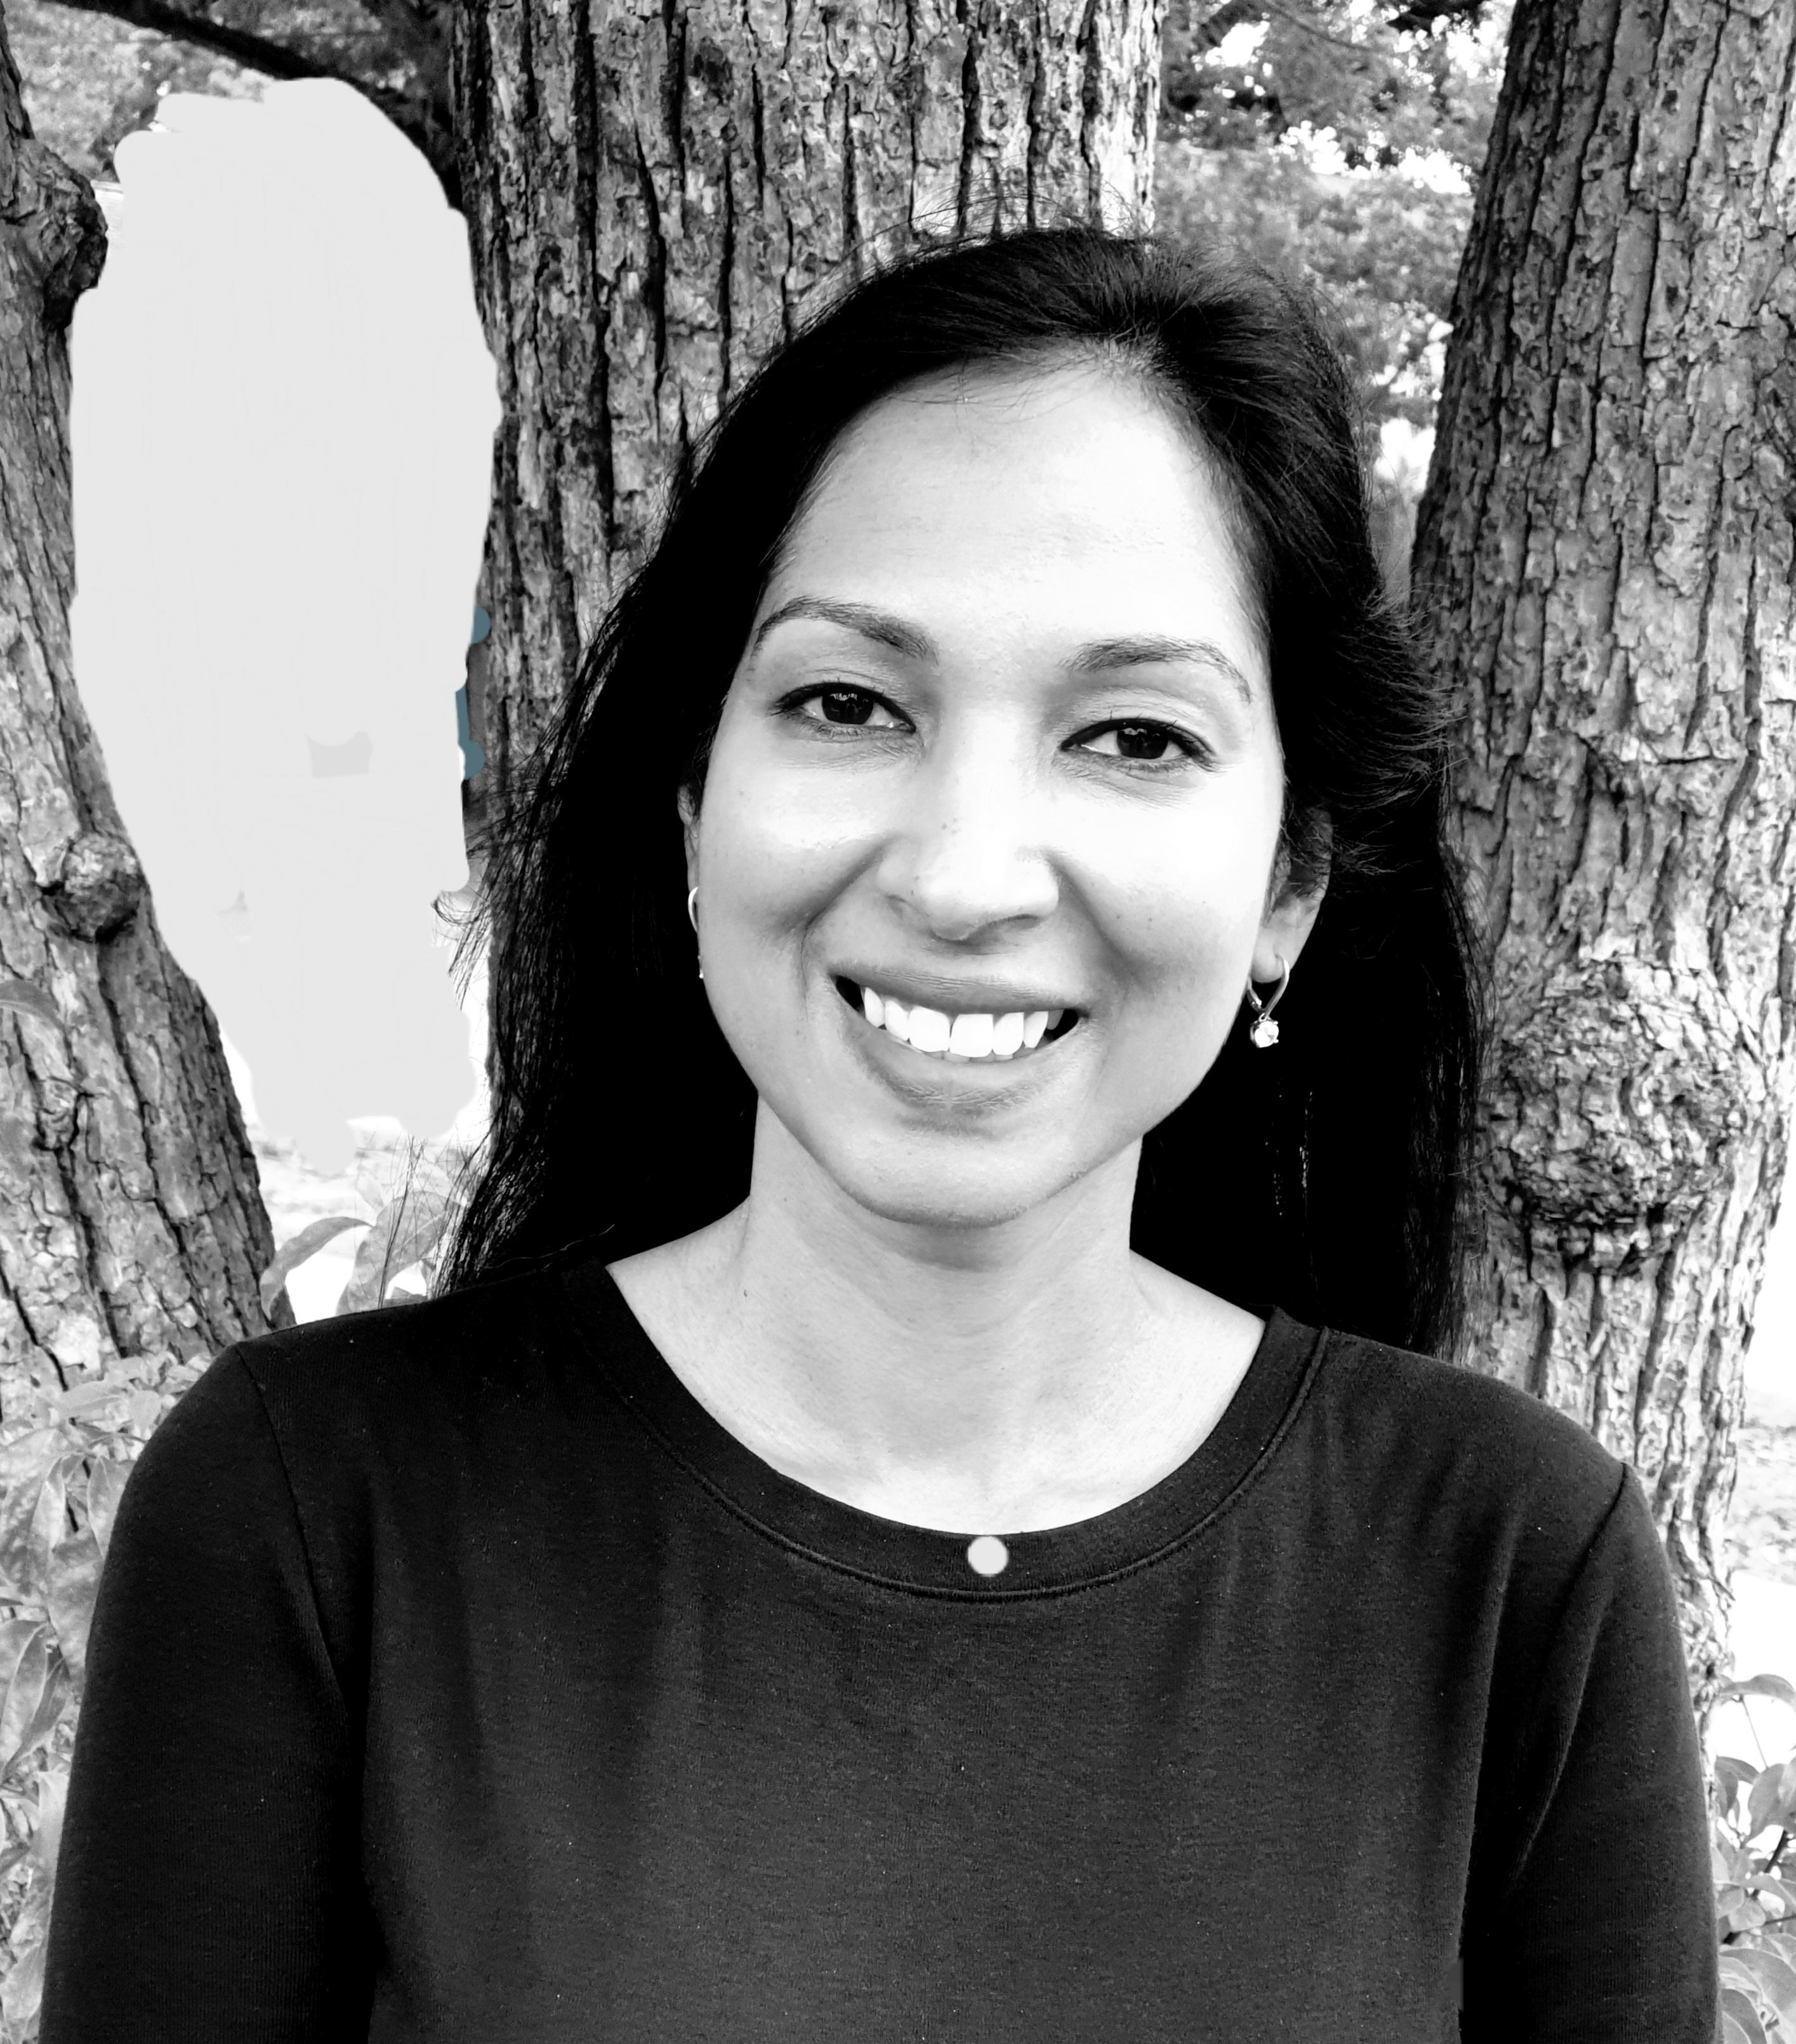 Dr. Nina Patel